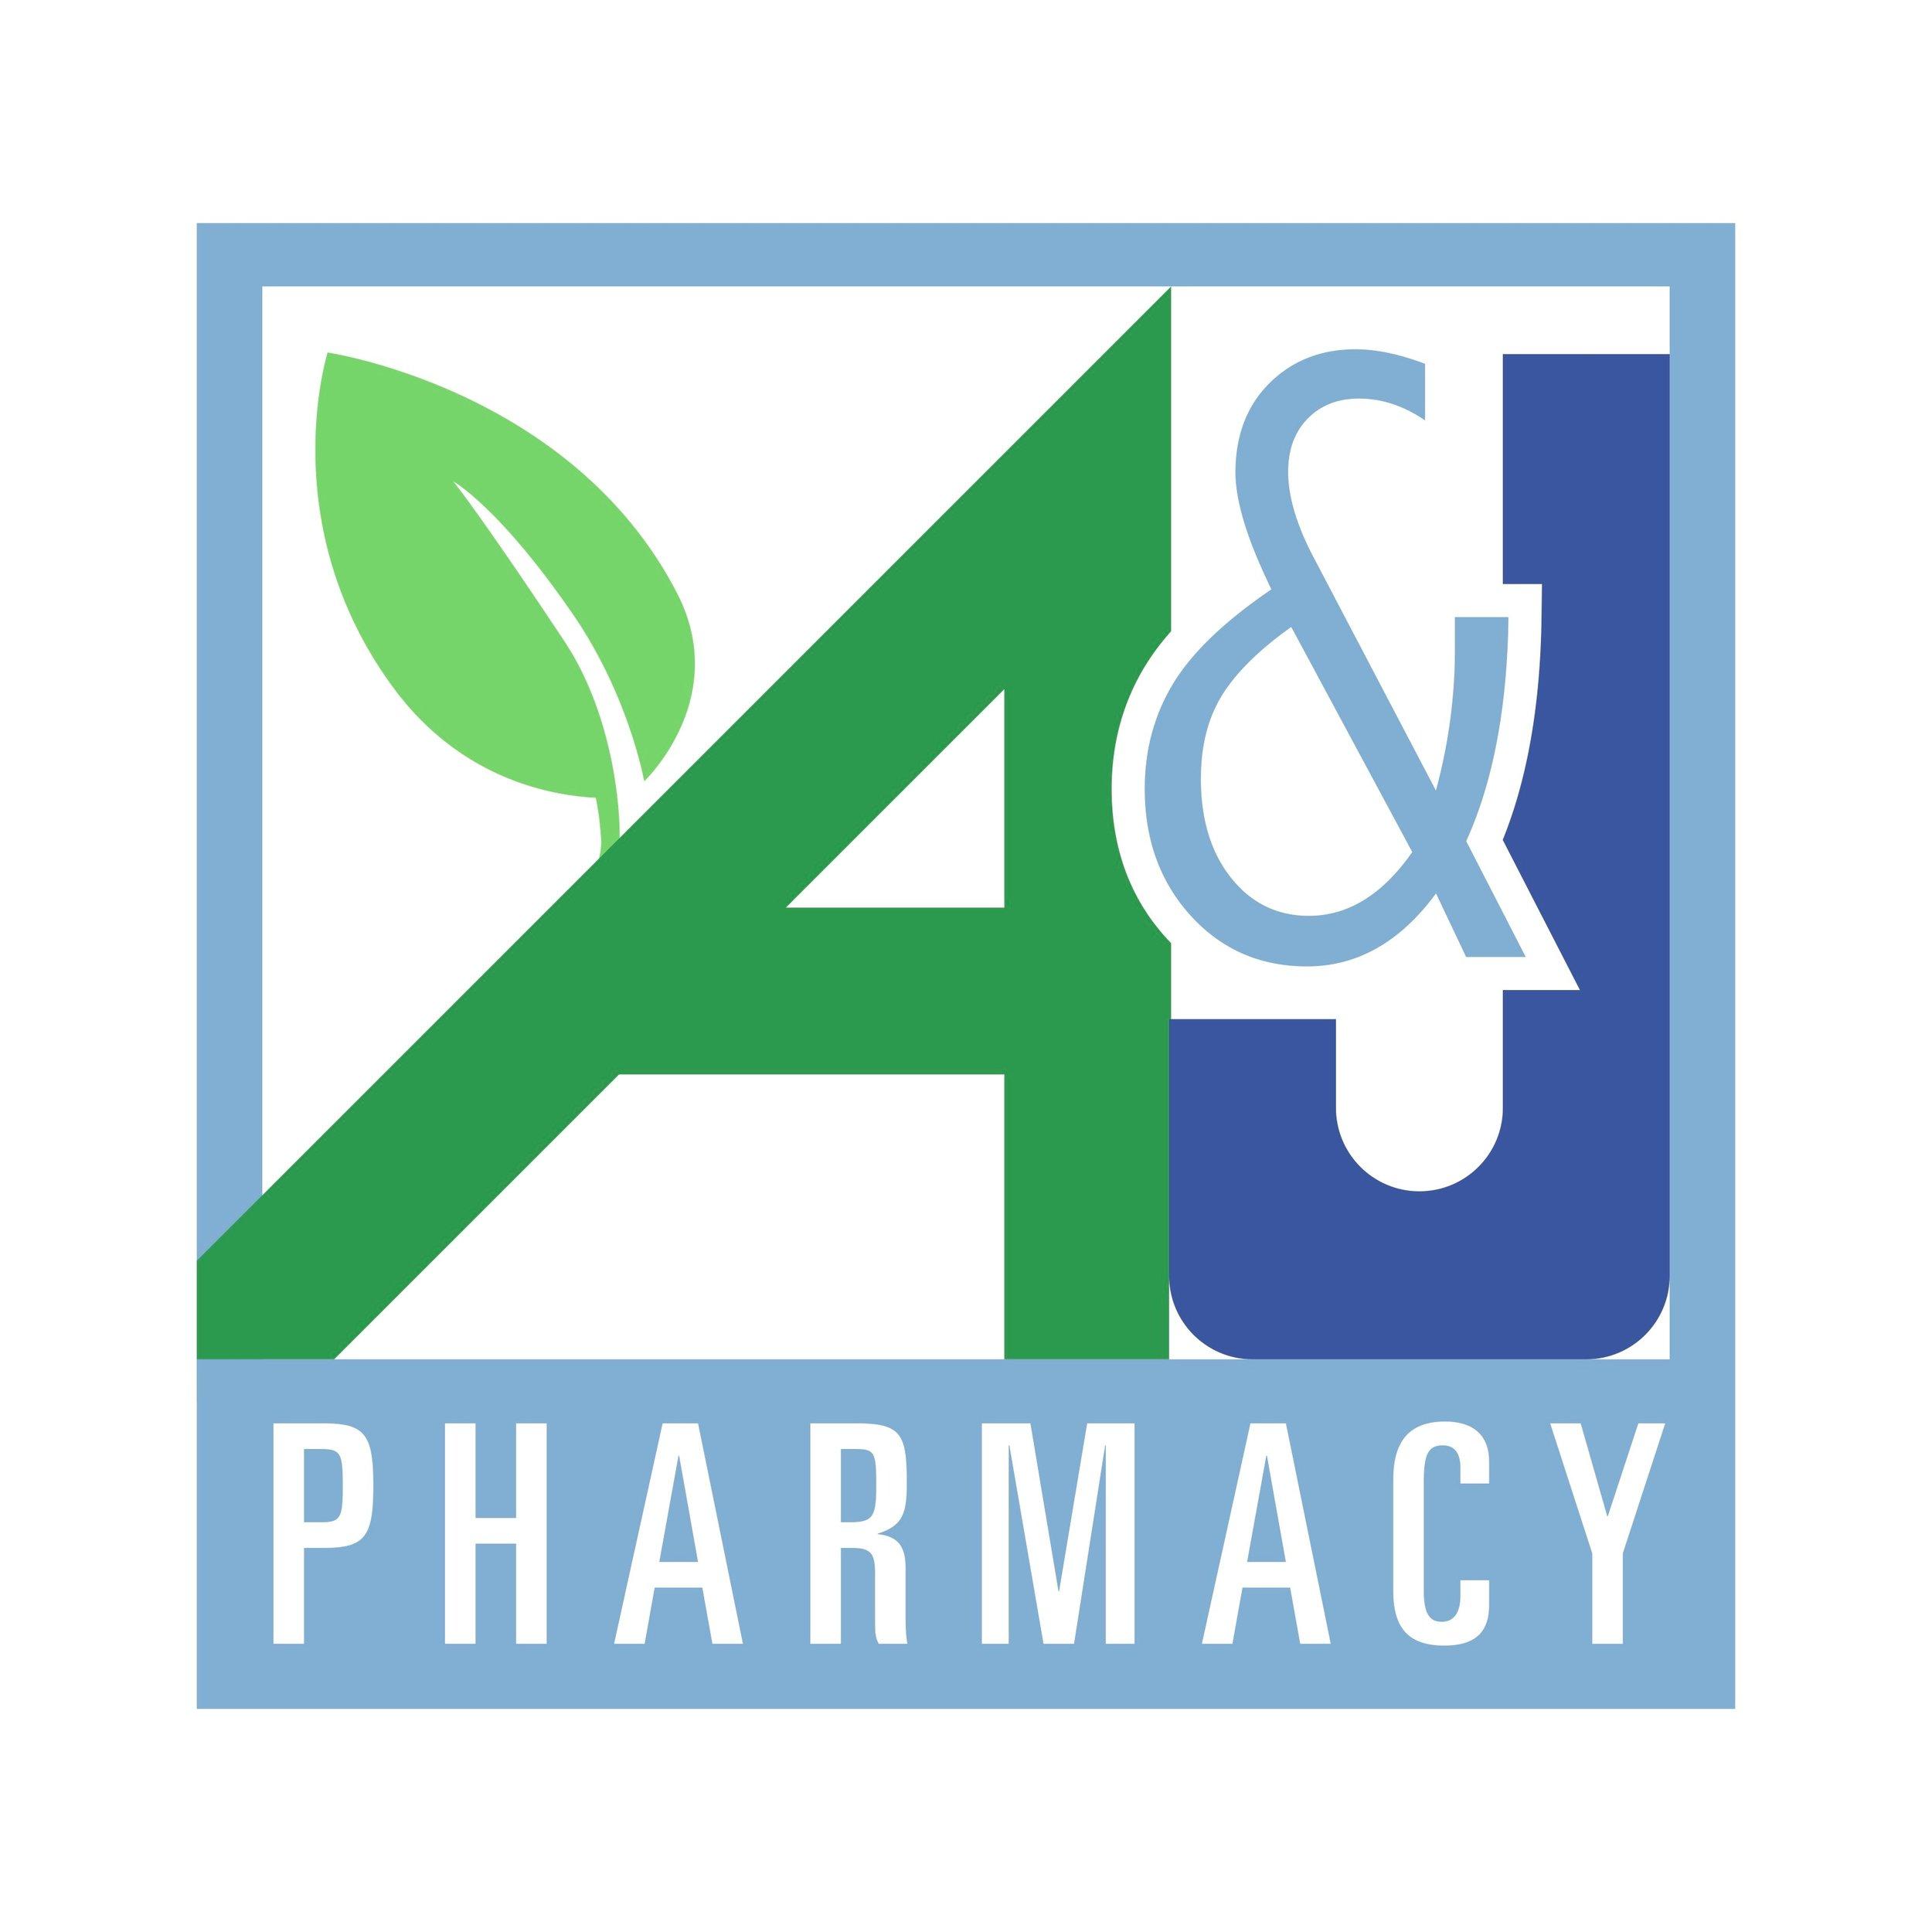 A and J logo.jpg